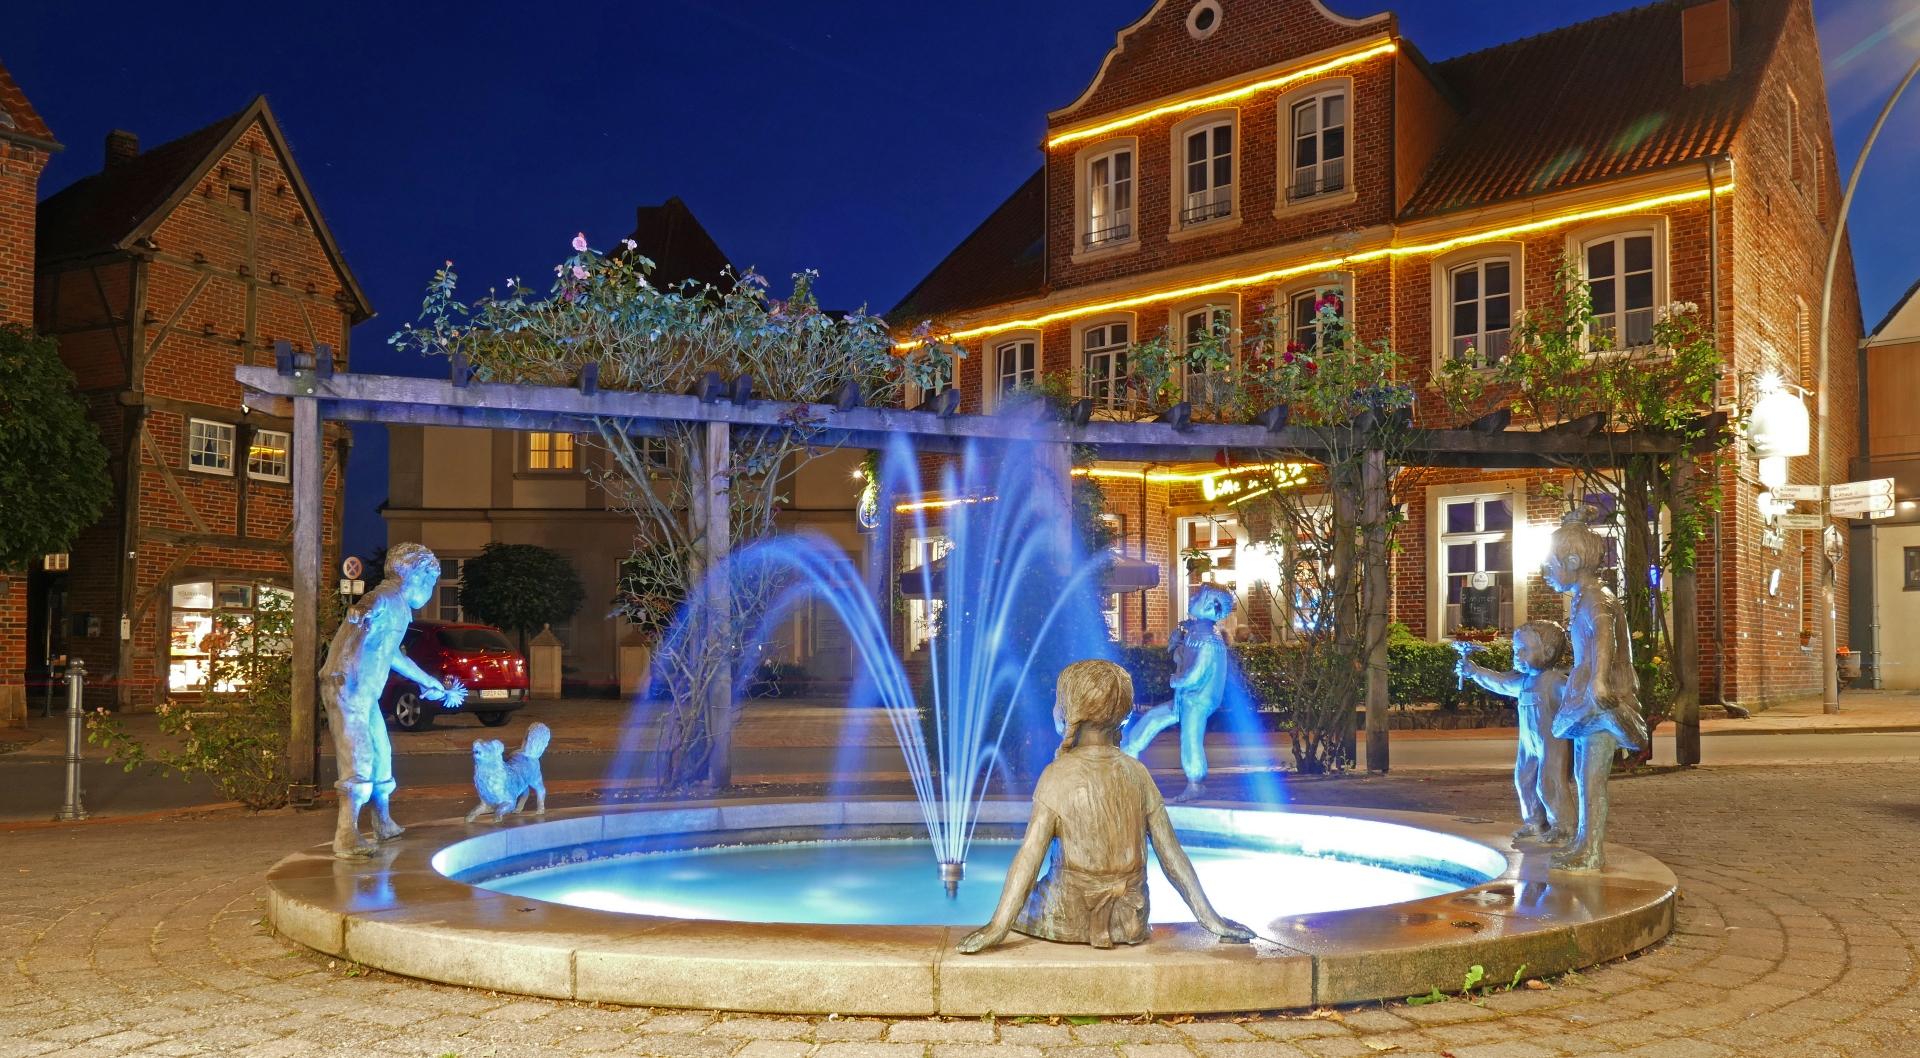 Springbrunnen Apotheke